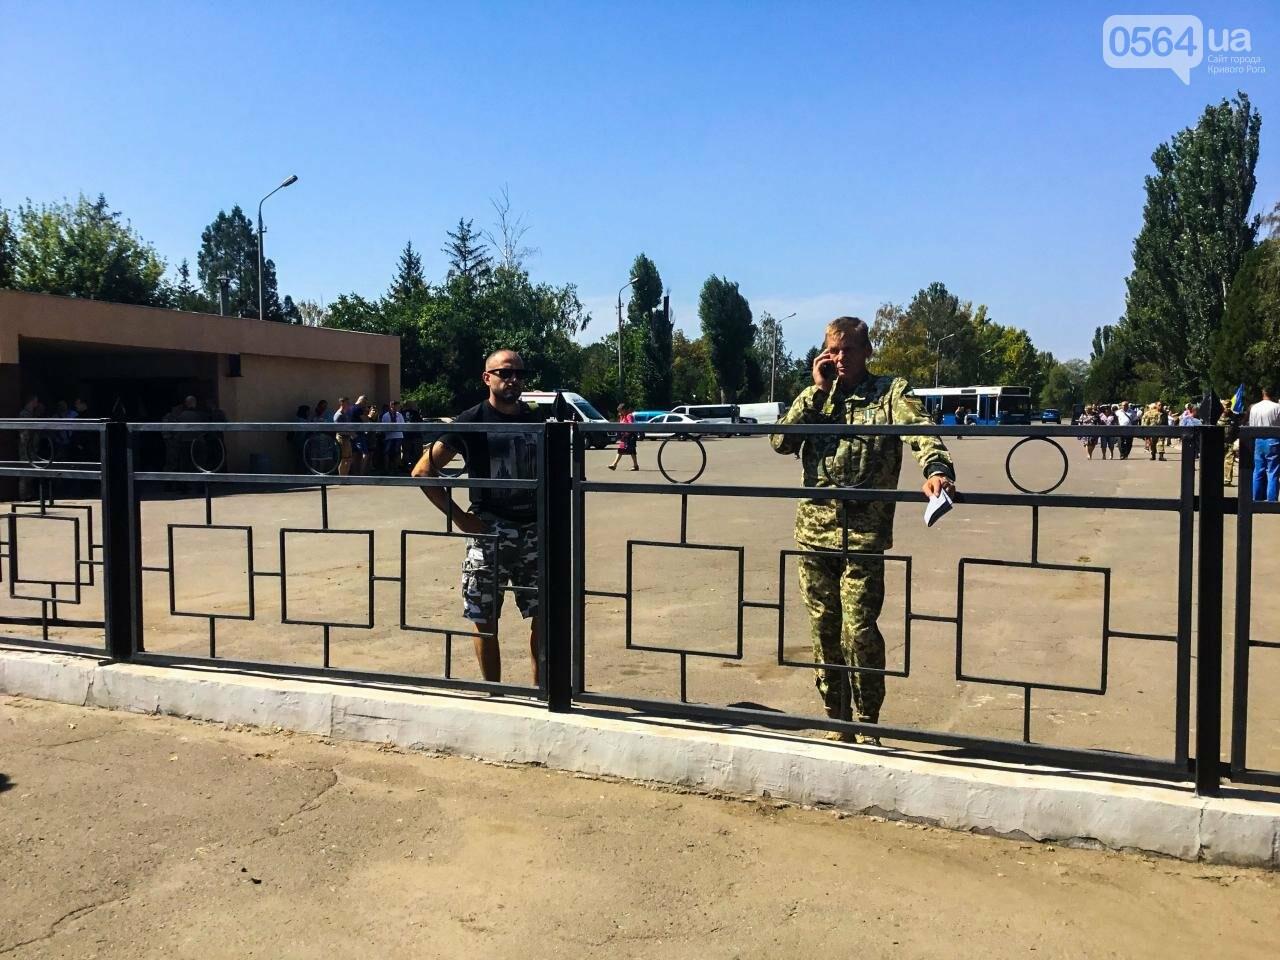 На Аллее Героев провели панихиду по погибшим в зоне АТО криворожанам, - ФОТО , фото-5